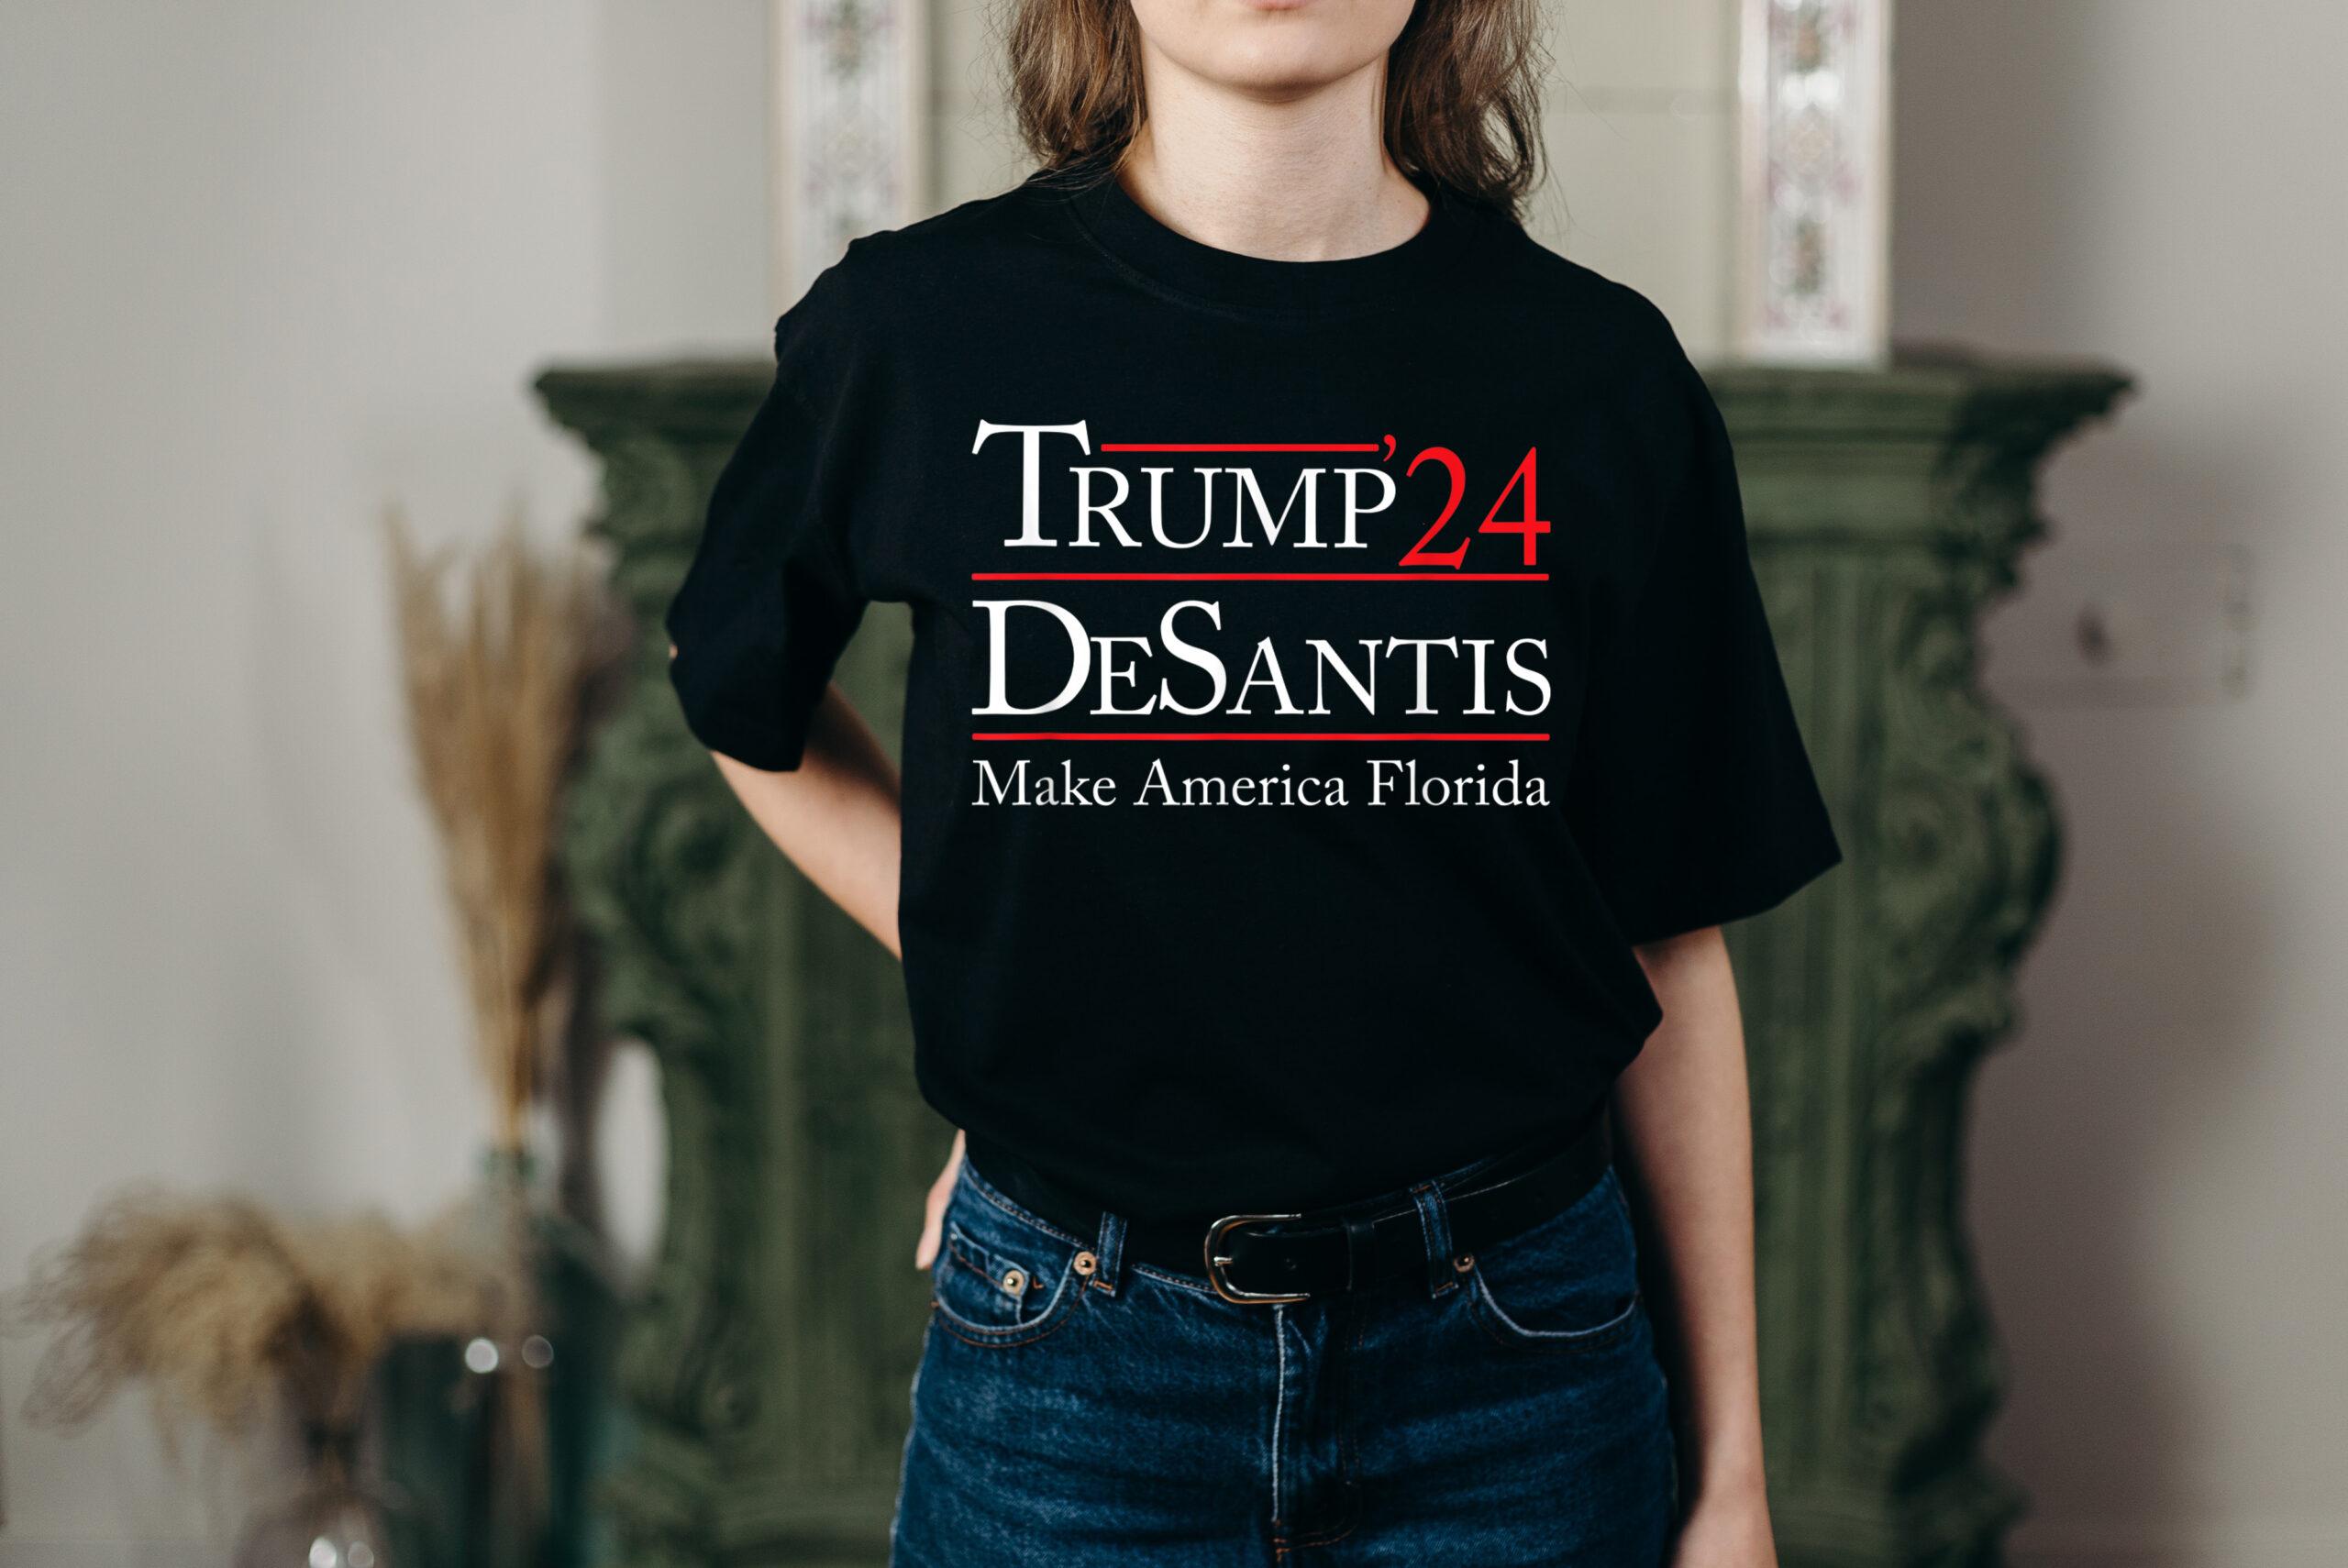 Trump 2024 Shirt Trump 24 Desantis Make America Florida